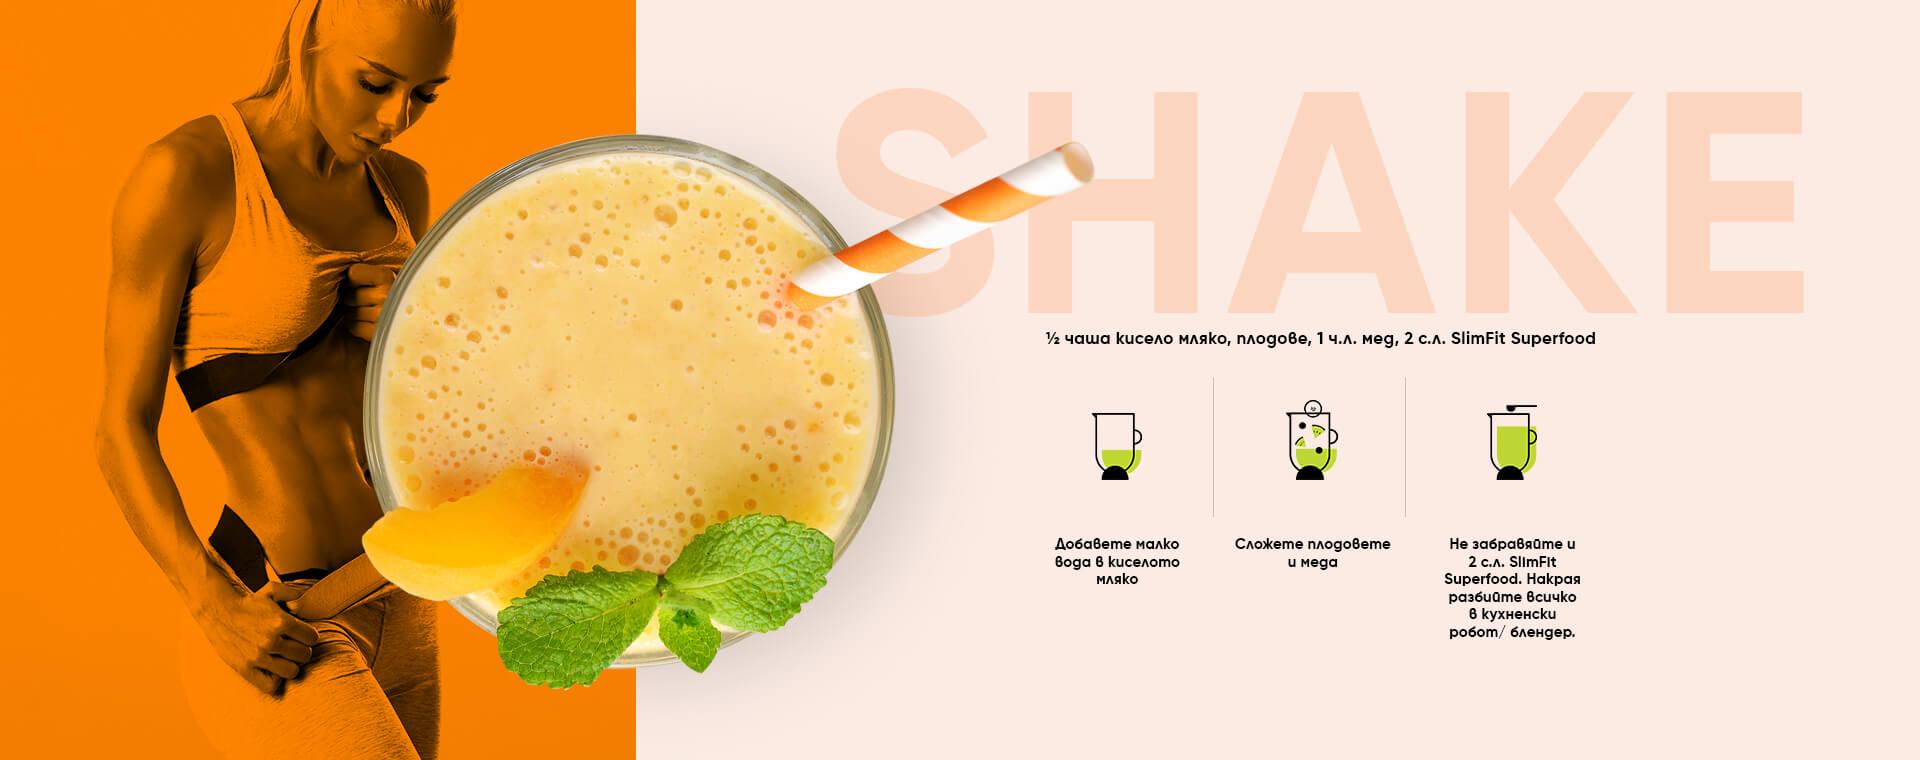 recepies-shake-desktop-bg